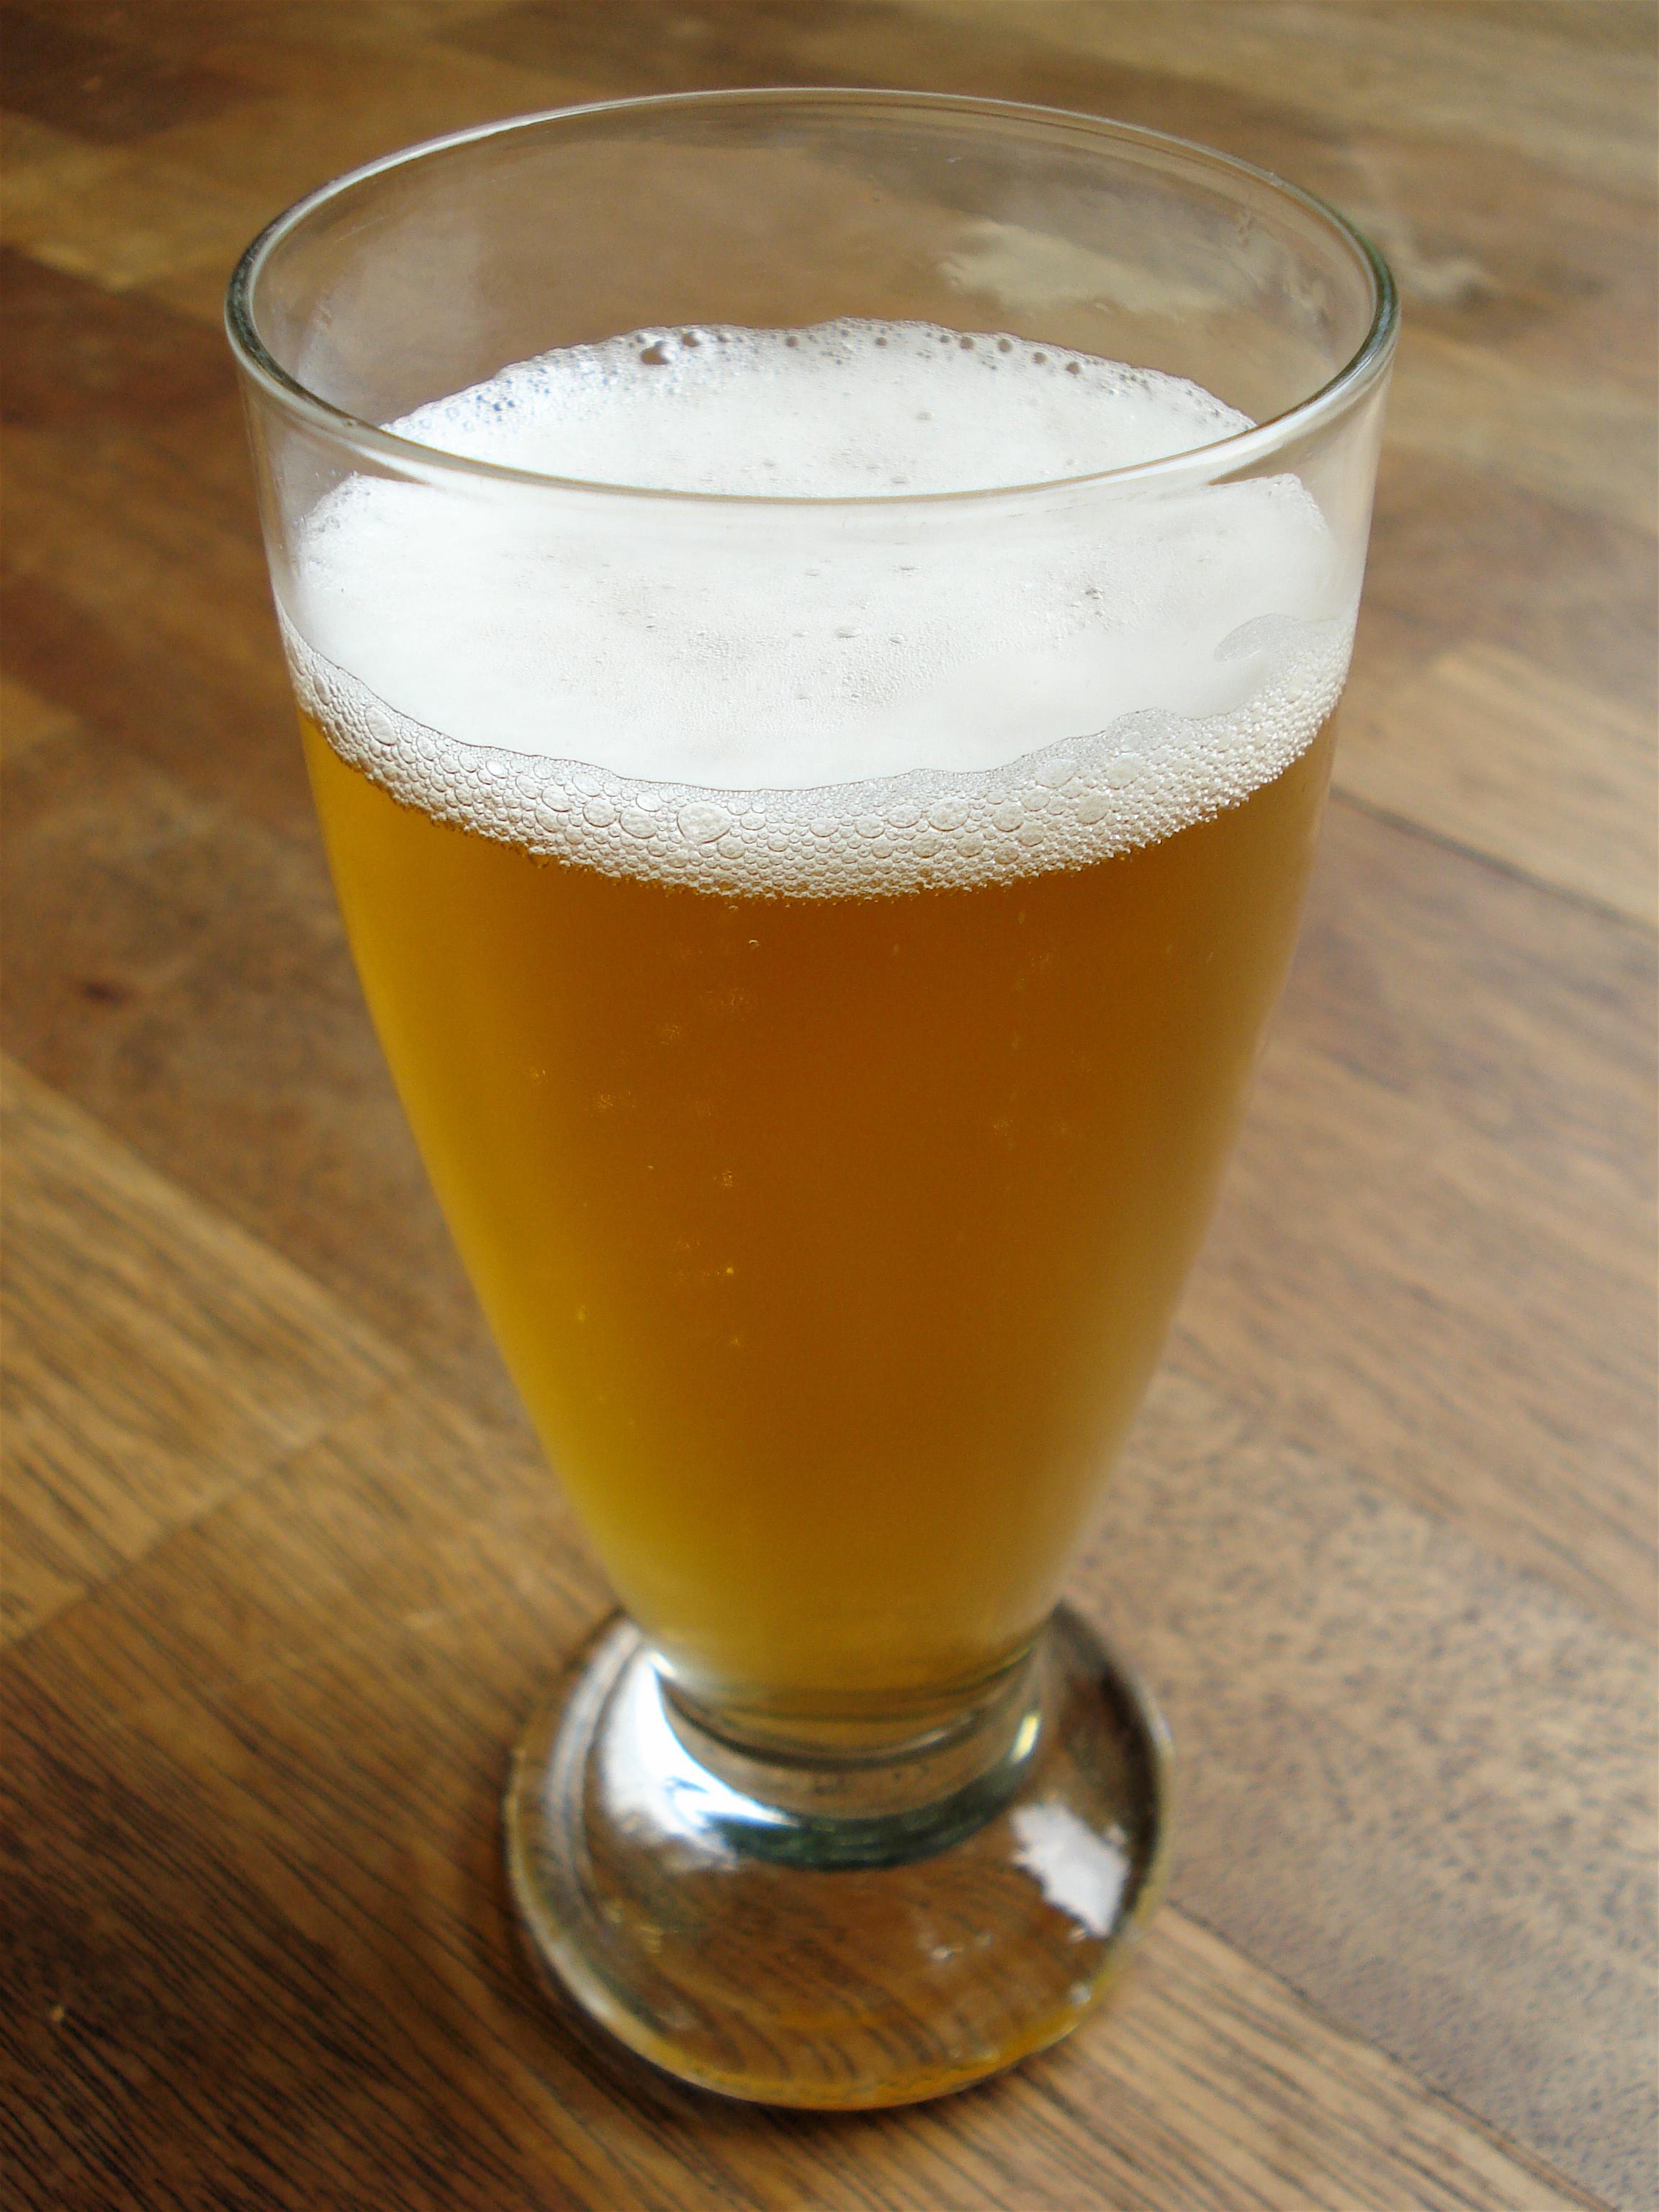 Belgian_beer_glass.jpg